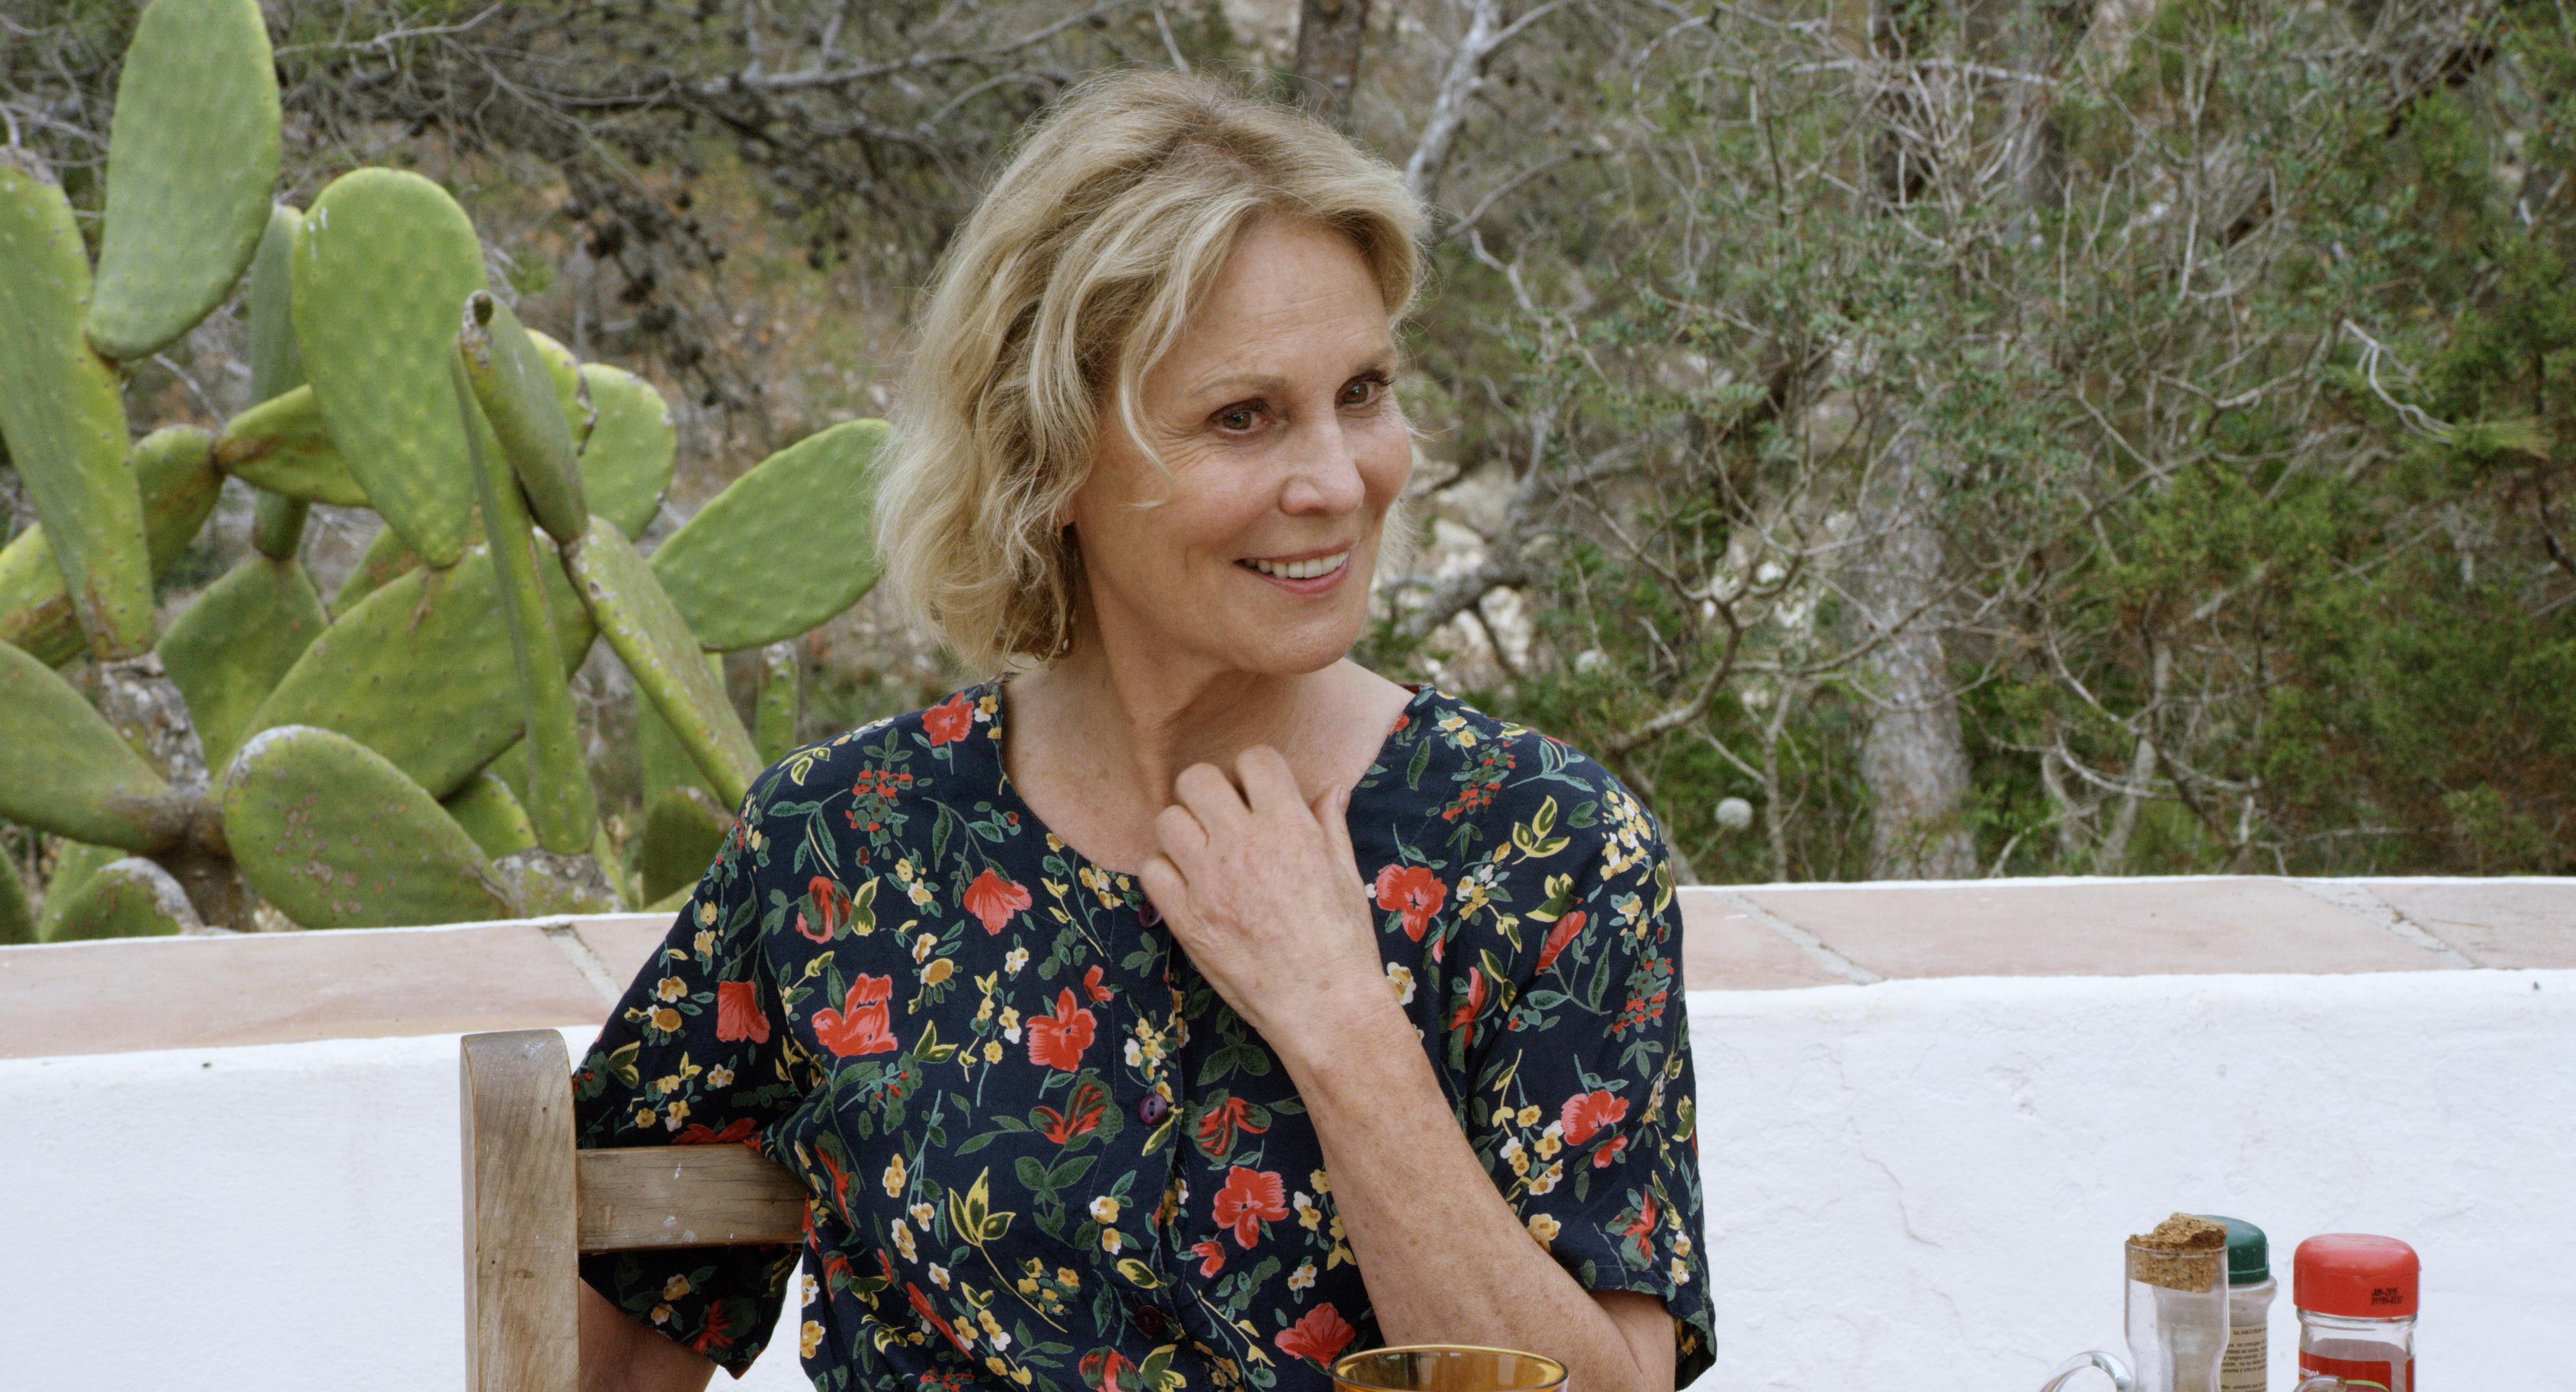 Amnesia: un'immagine di Marthe Keller nel film di Barbet Schroeder